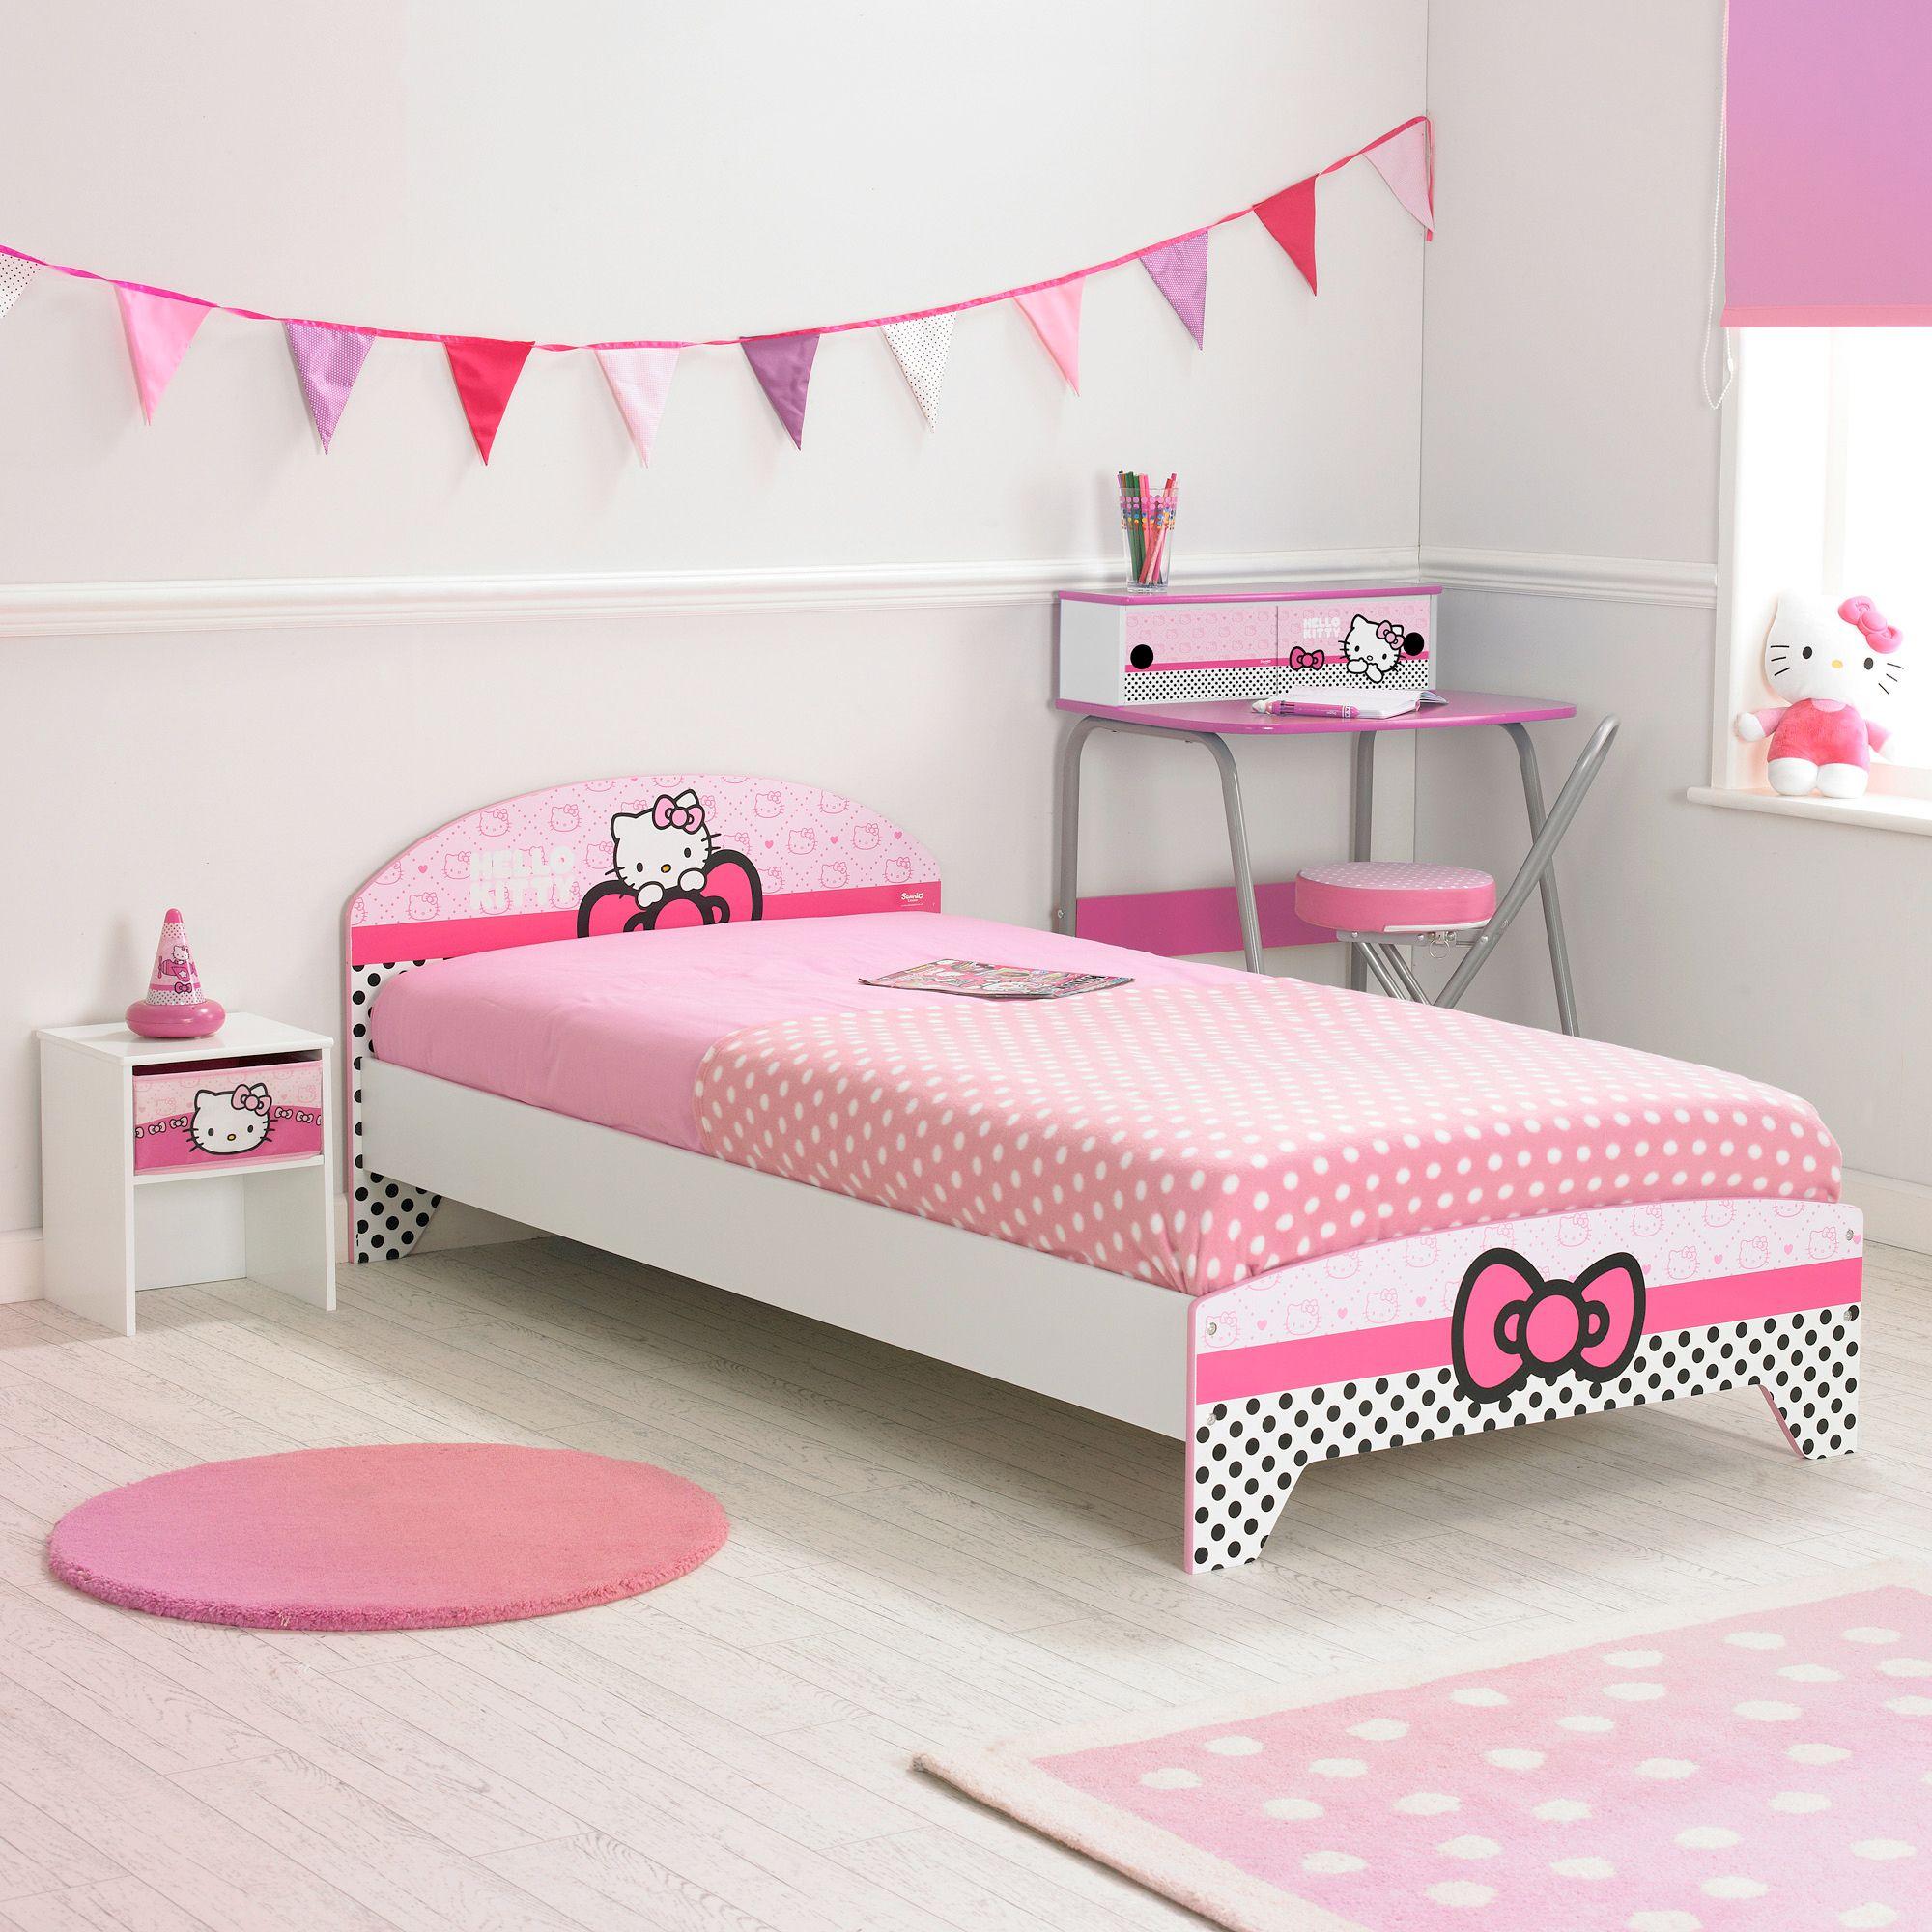 lit enfant a conforama good lit surlev lit enfant erik avec rideaux tunnel bleu rouge pin. Black Bedroom Furniture Sets. Home Design Ideas